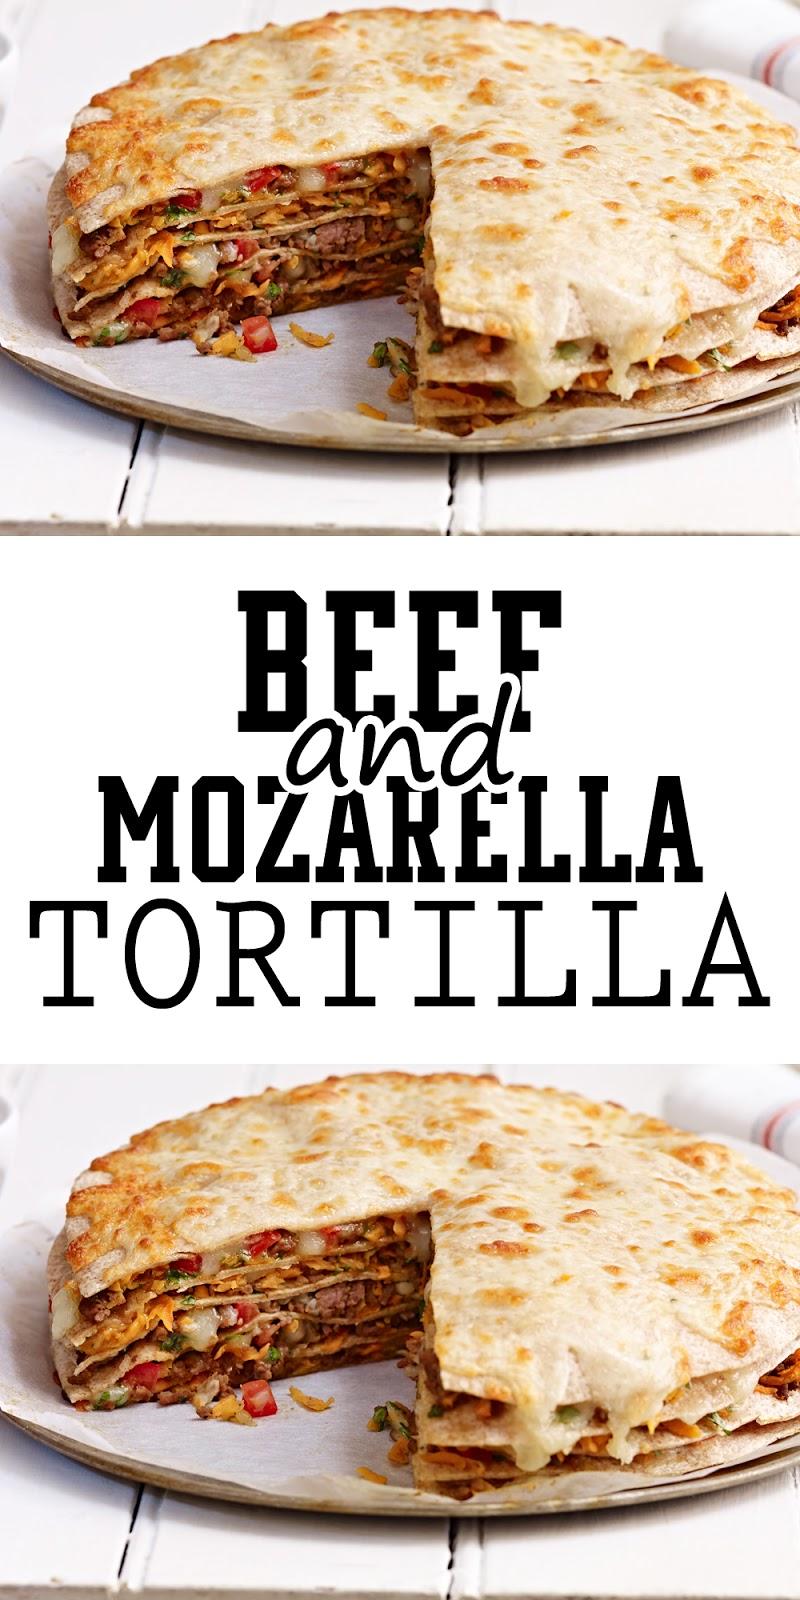 BEEF AND MOZZARELLA TORTILLA